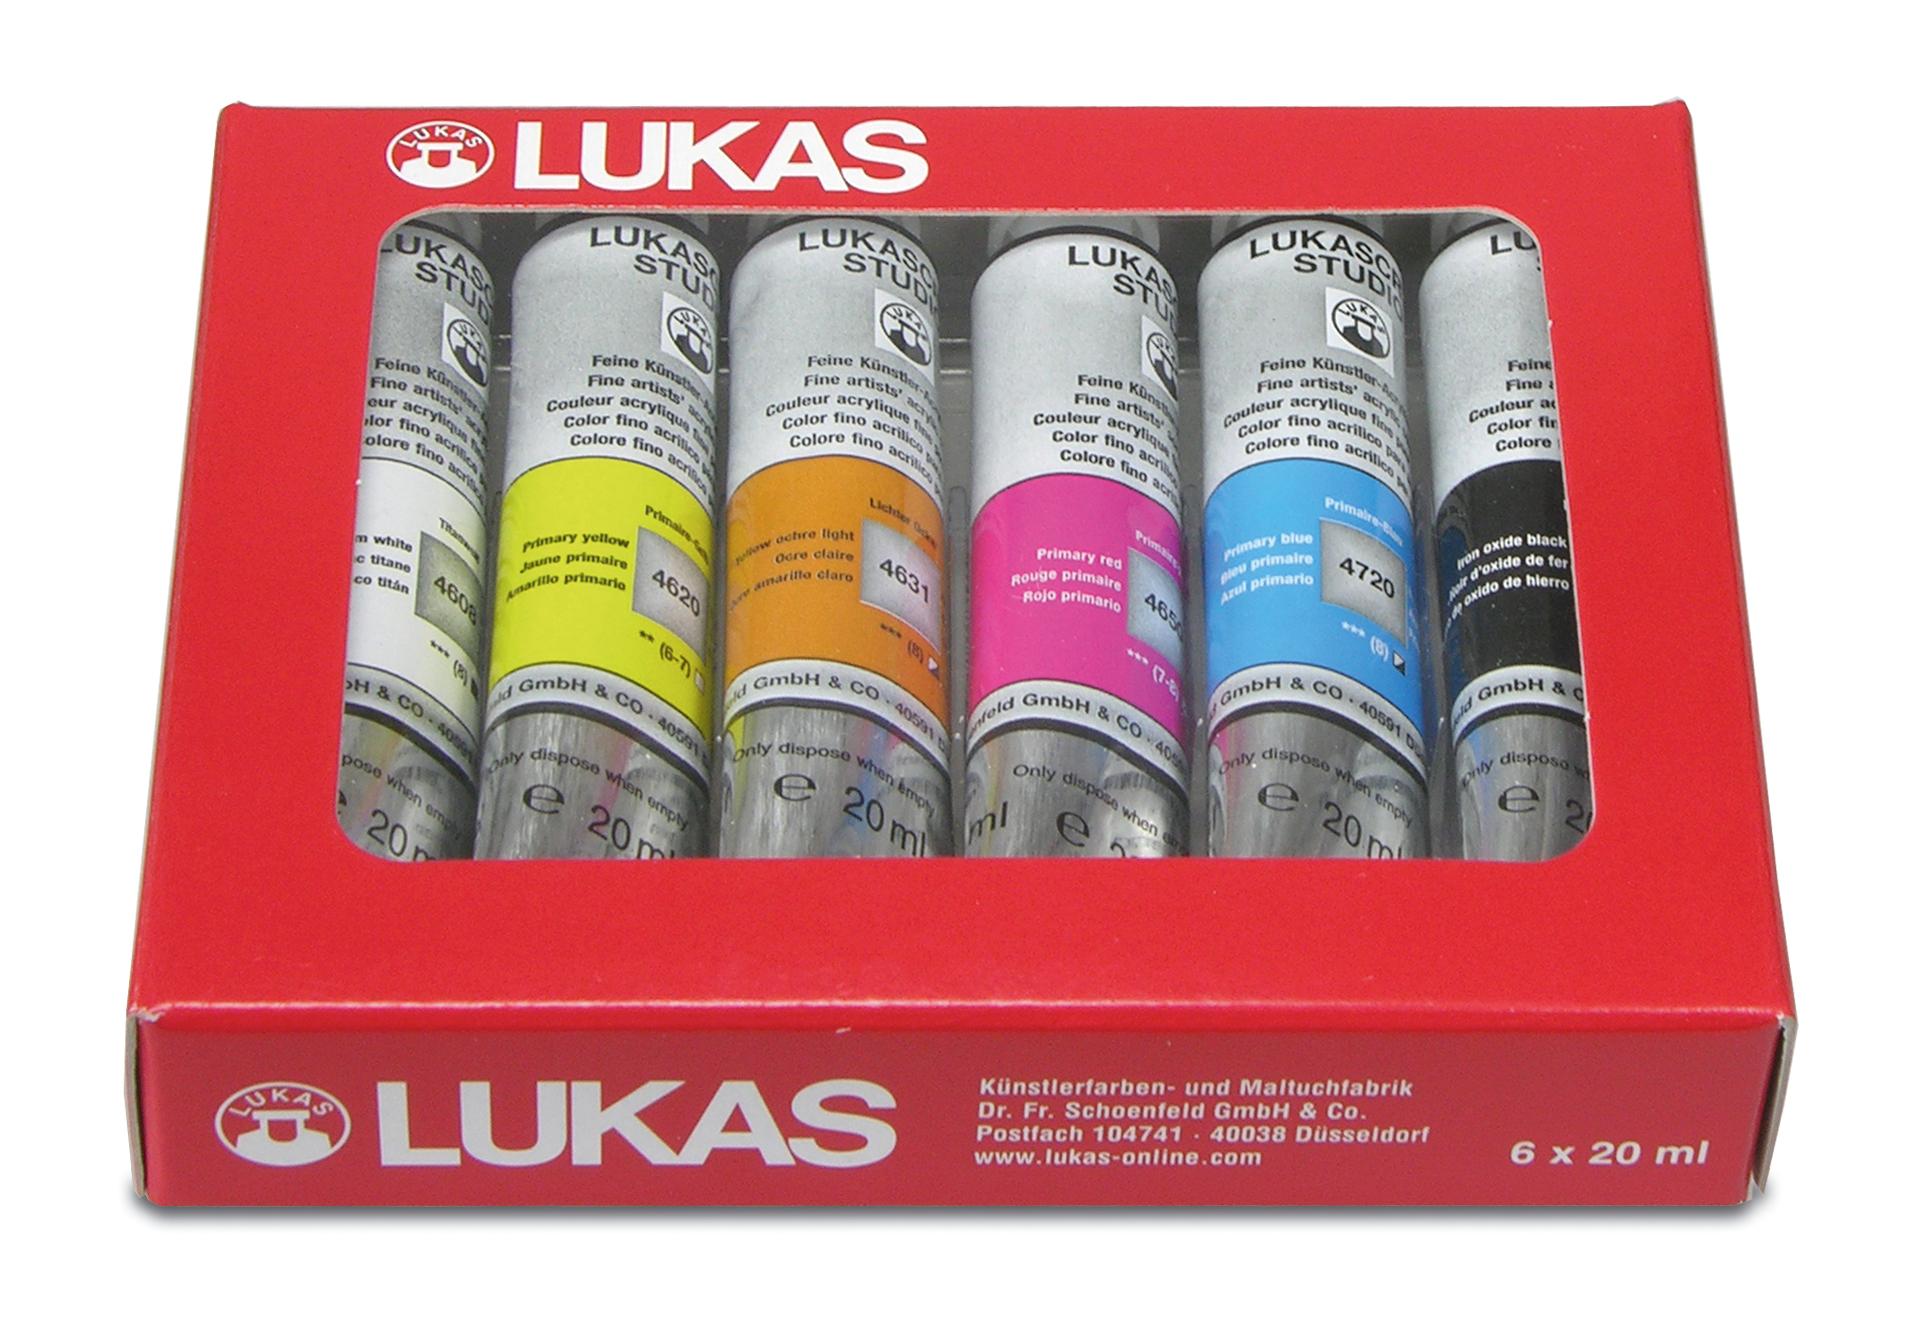 Lukas Cryl Studio - Acrylfarbensortiment 6x20ml